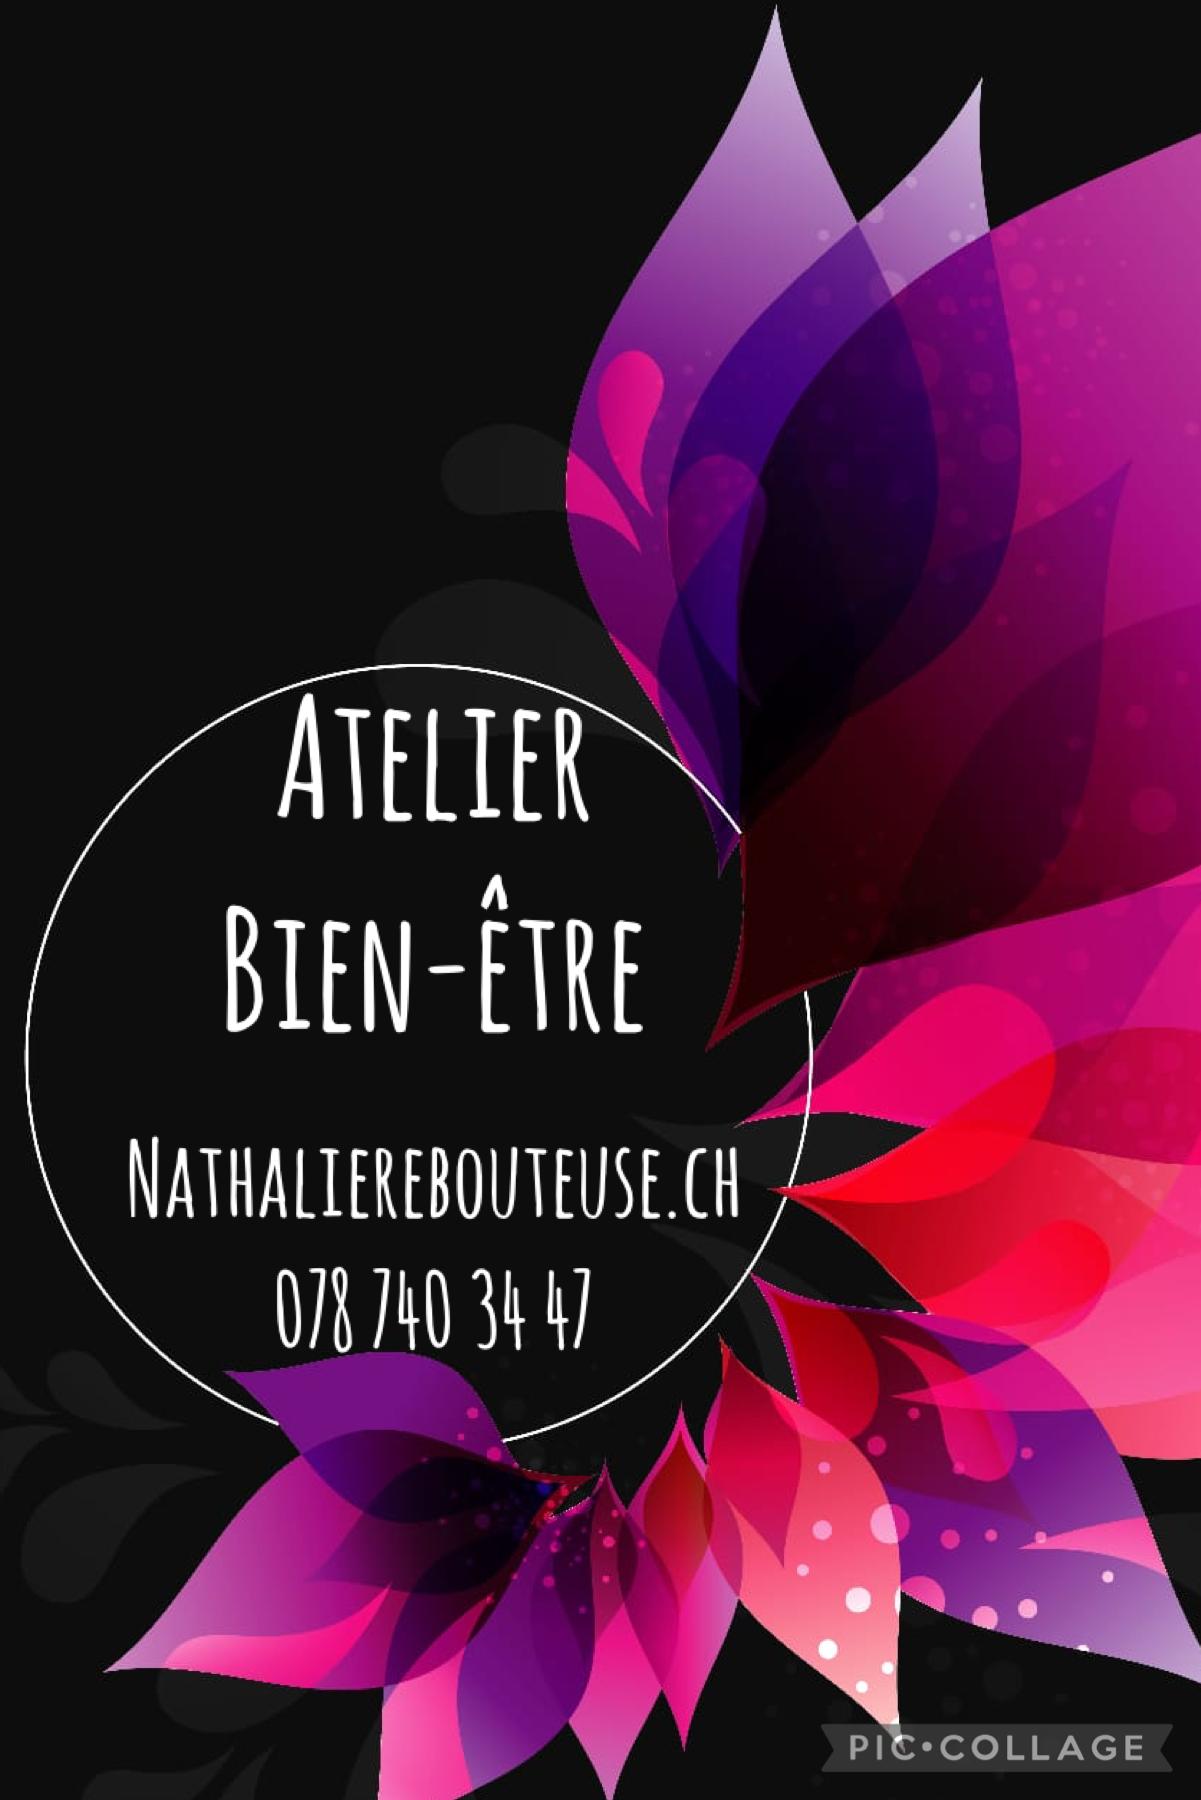 Nathalie Rebouteuse